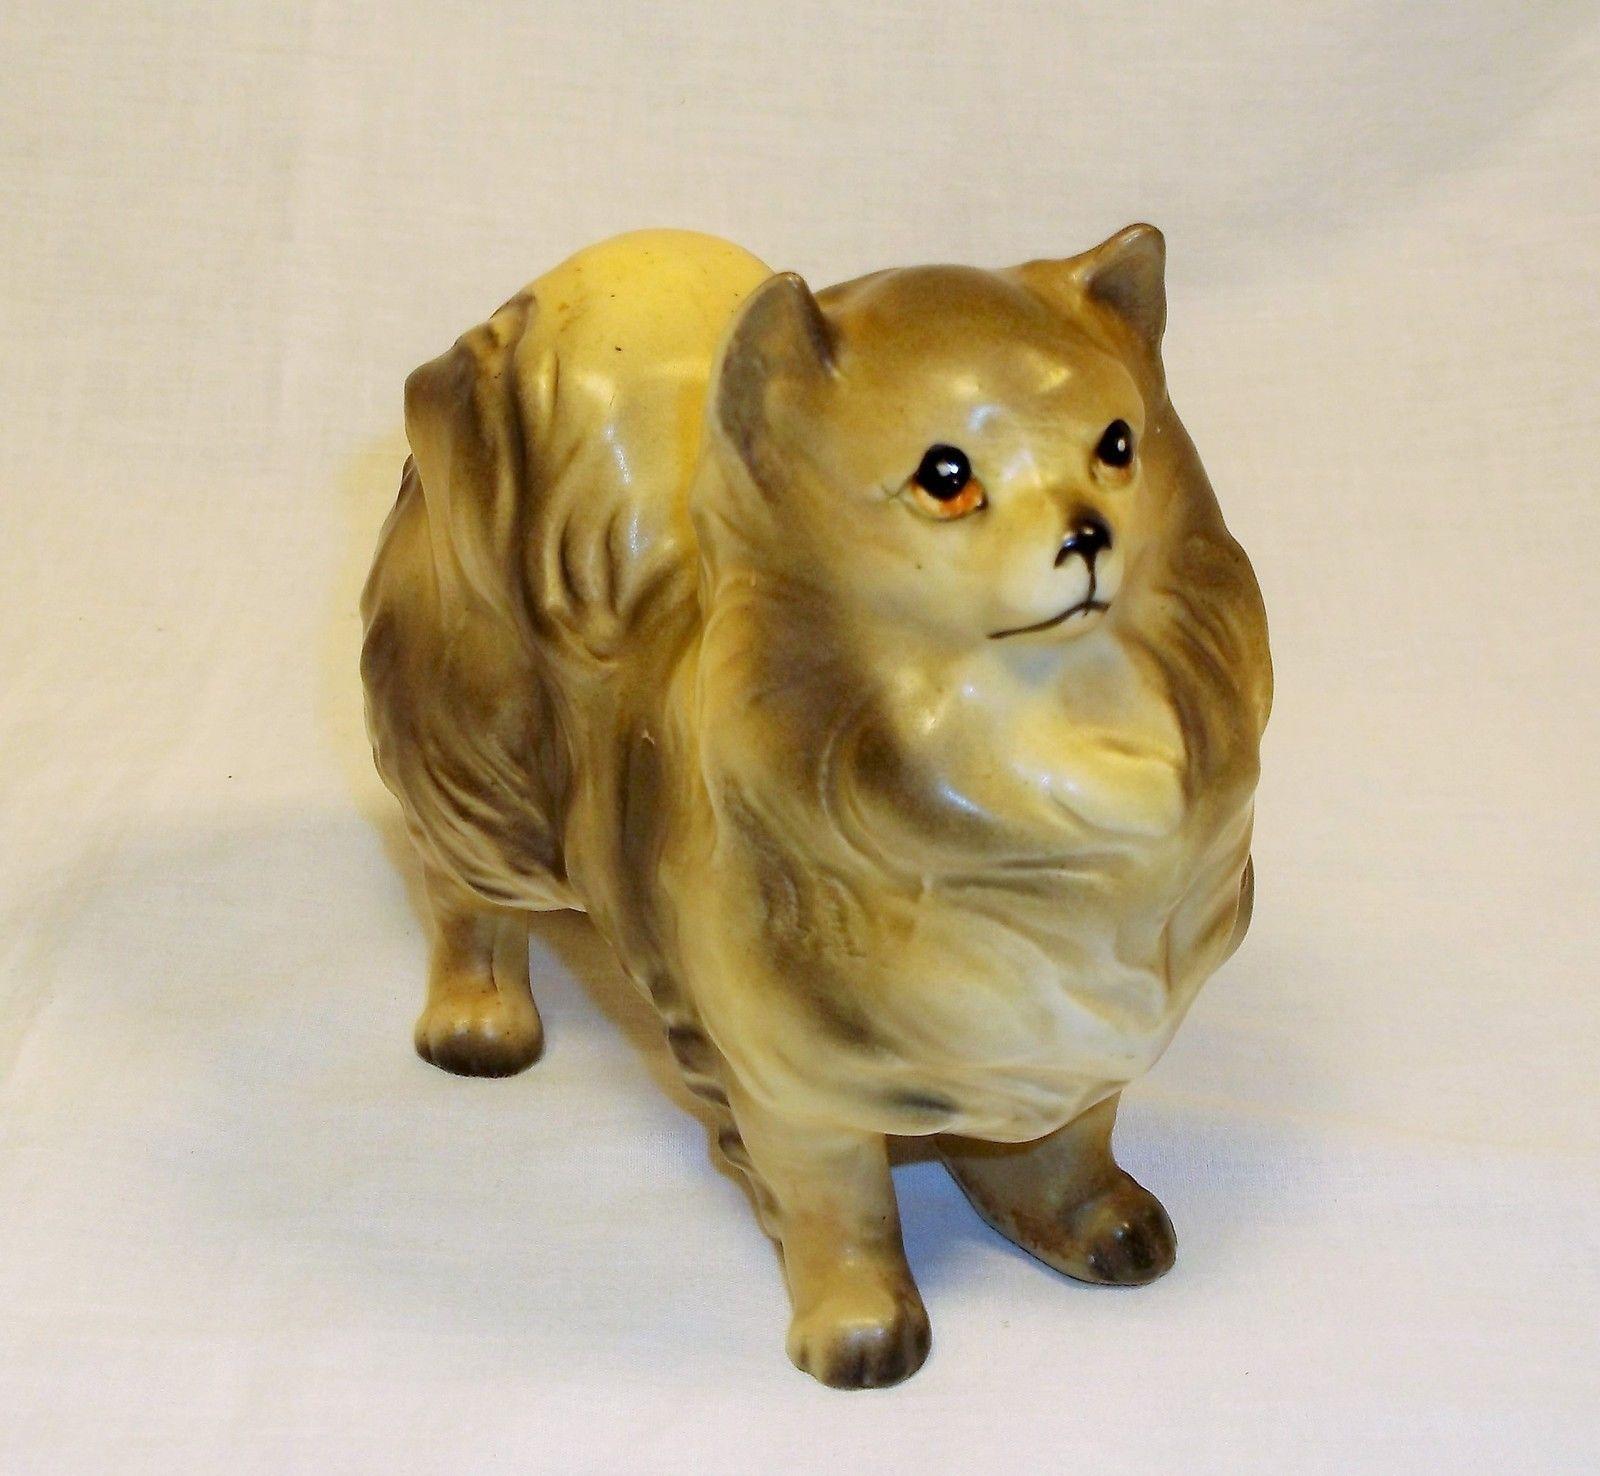 Vintage Pomeranian Ceramic Figurine Dog Figure Statue Pomeranian